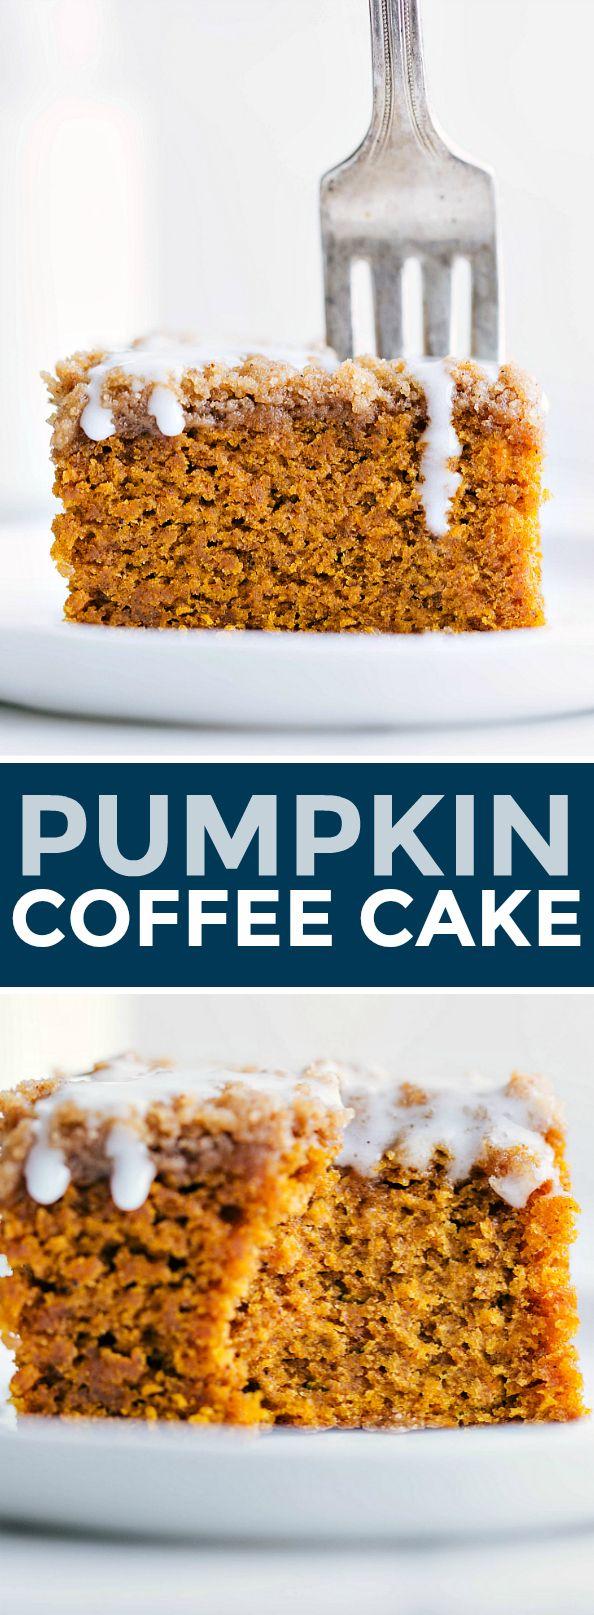 Moist, dense, and rich pumpkin coffee cake with a brown